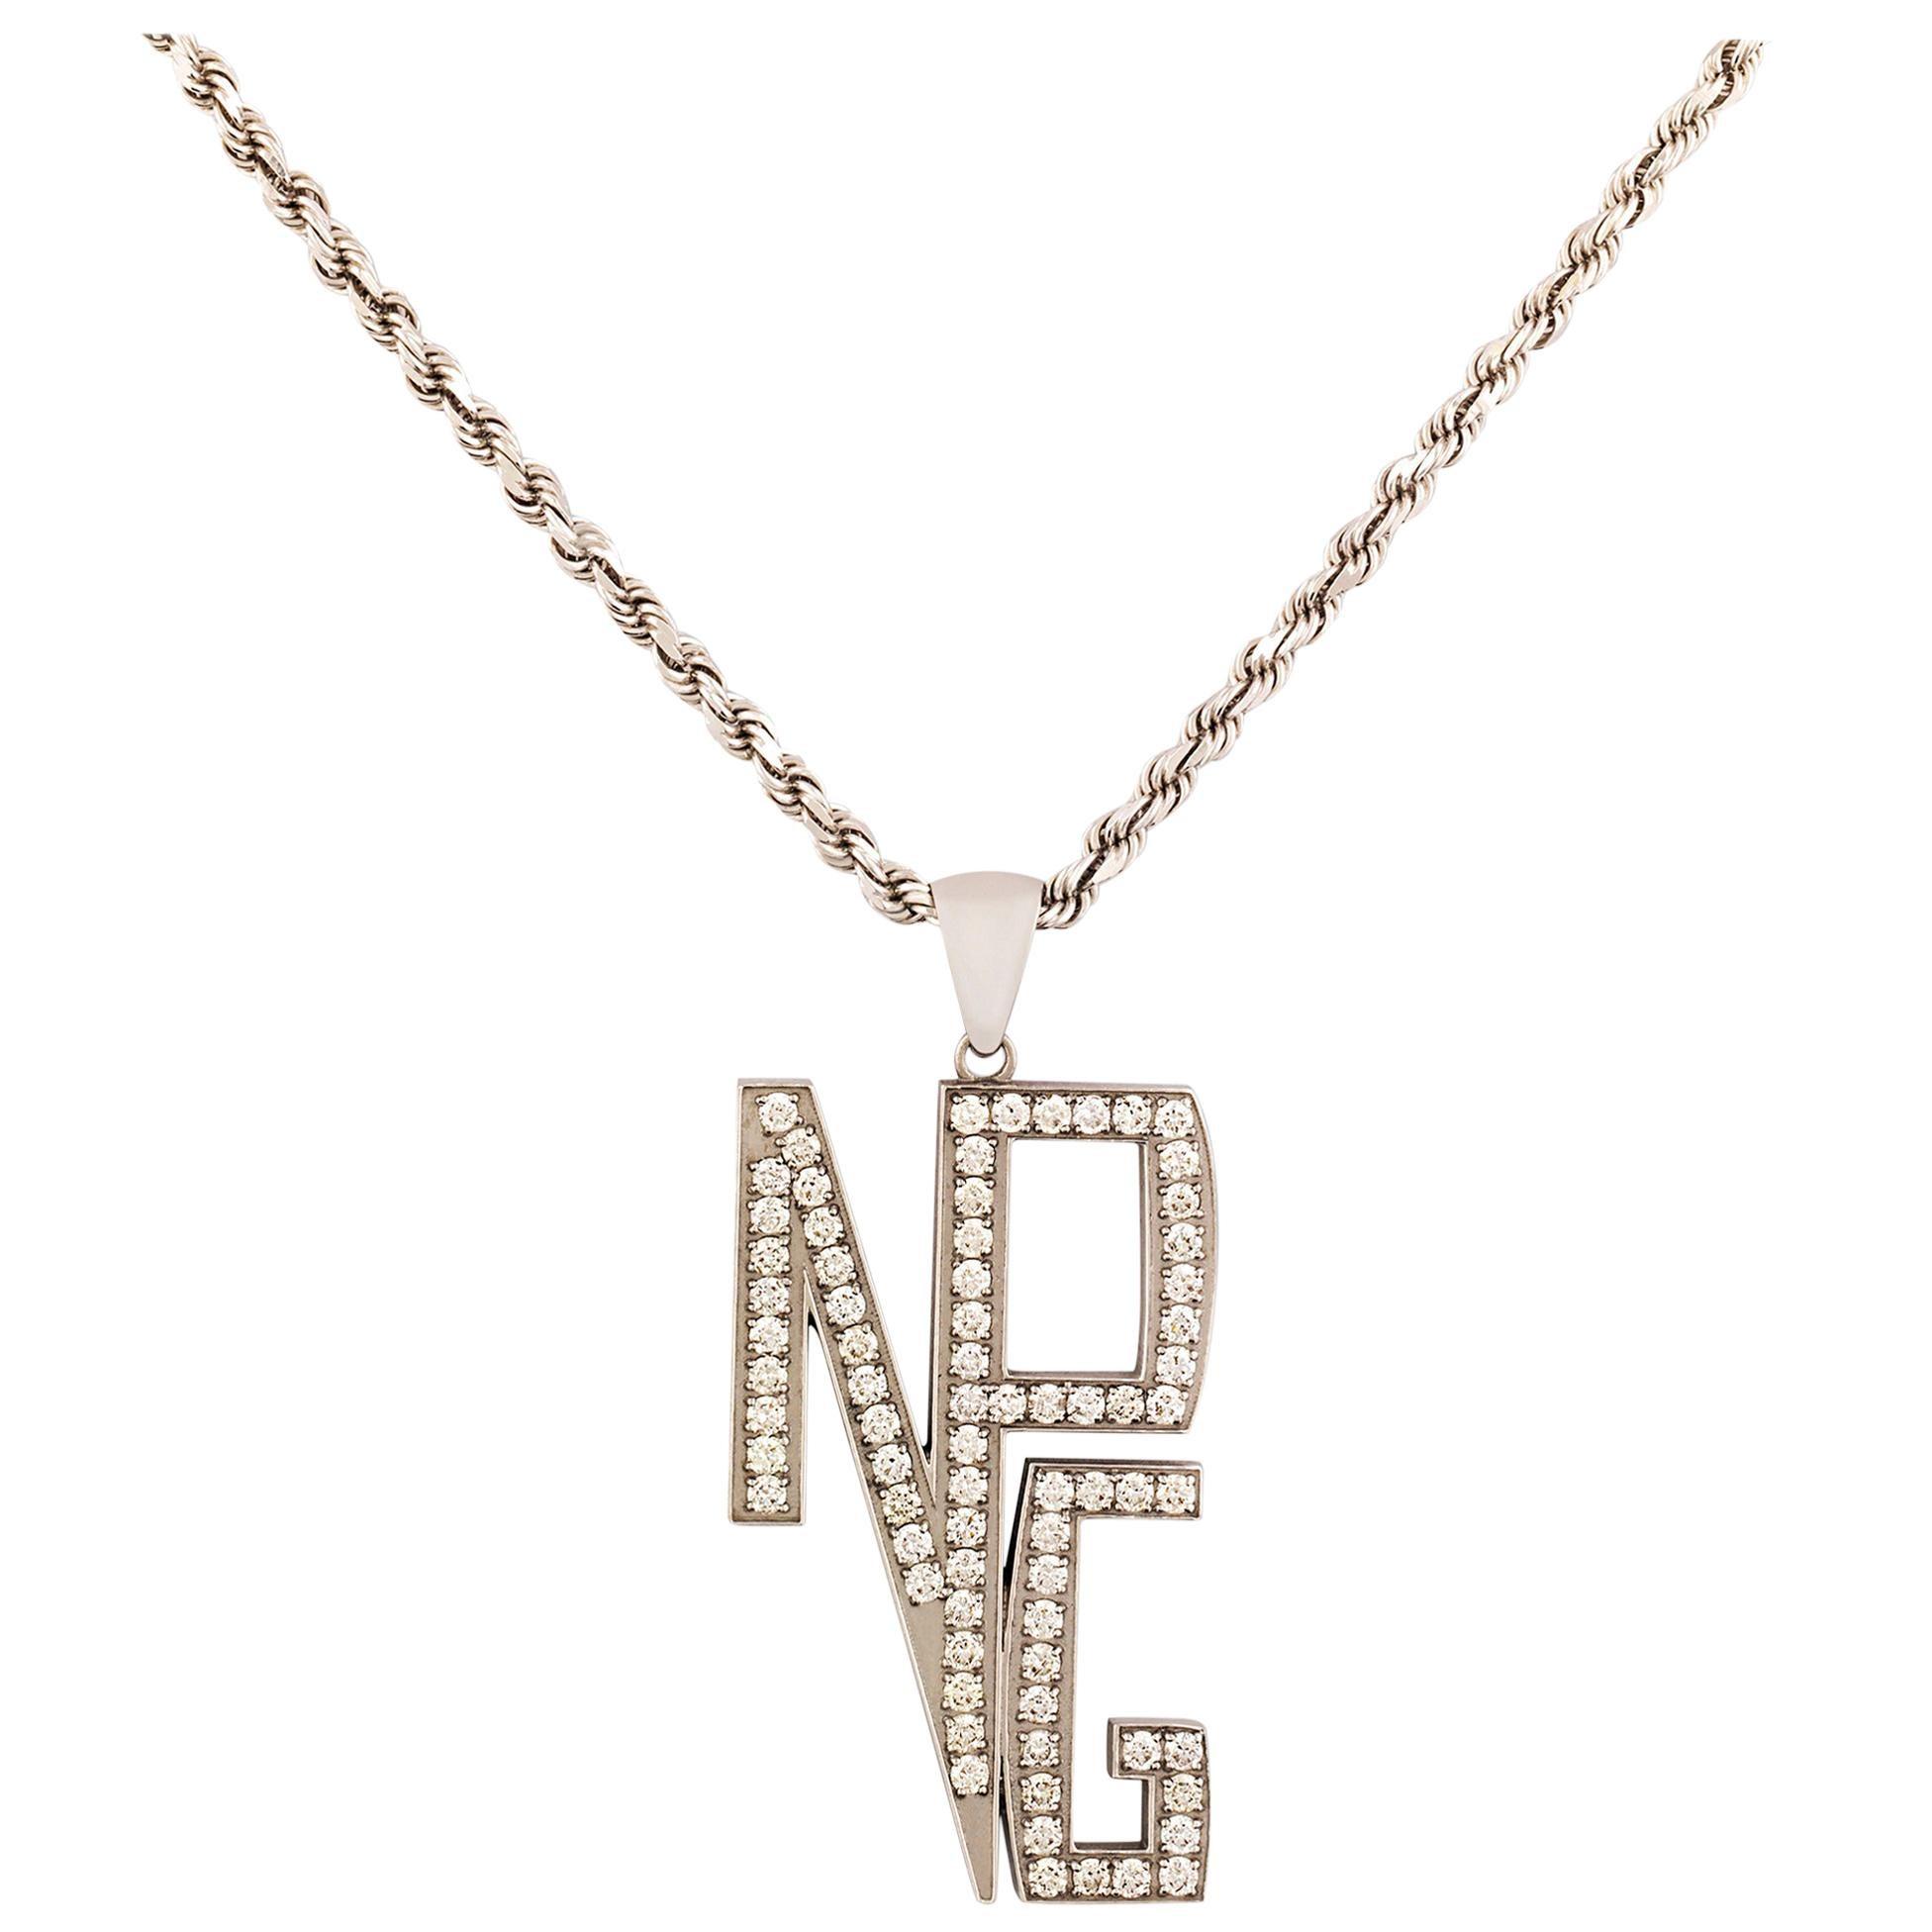 Prince's New Power Generation Diamond Necklace